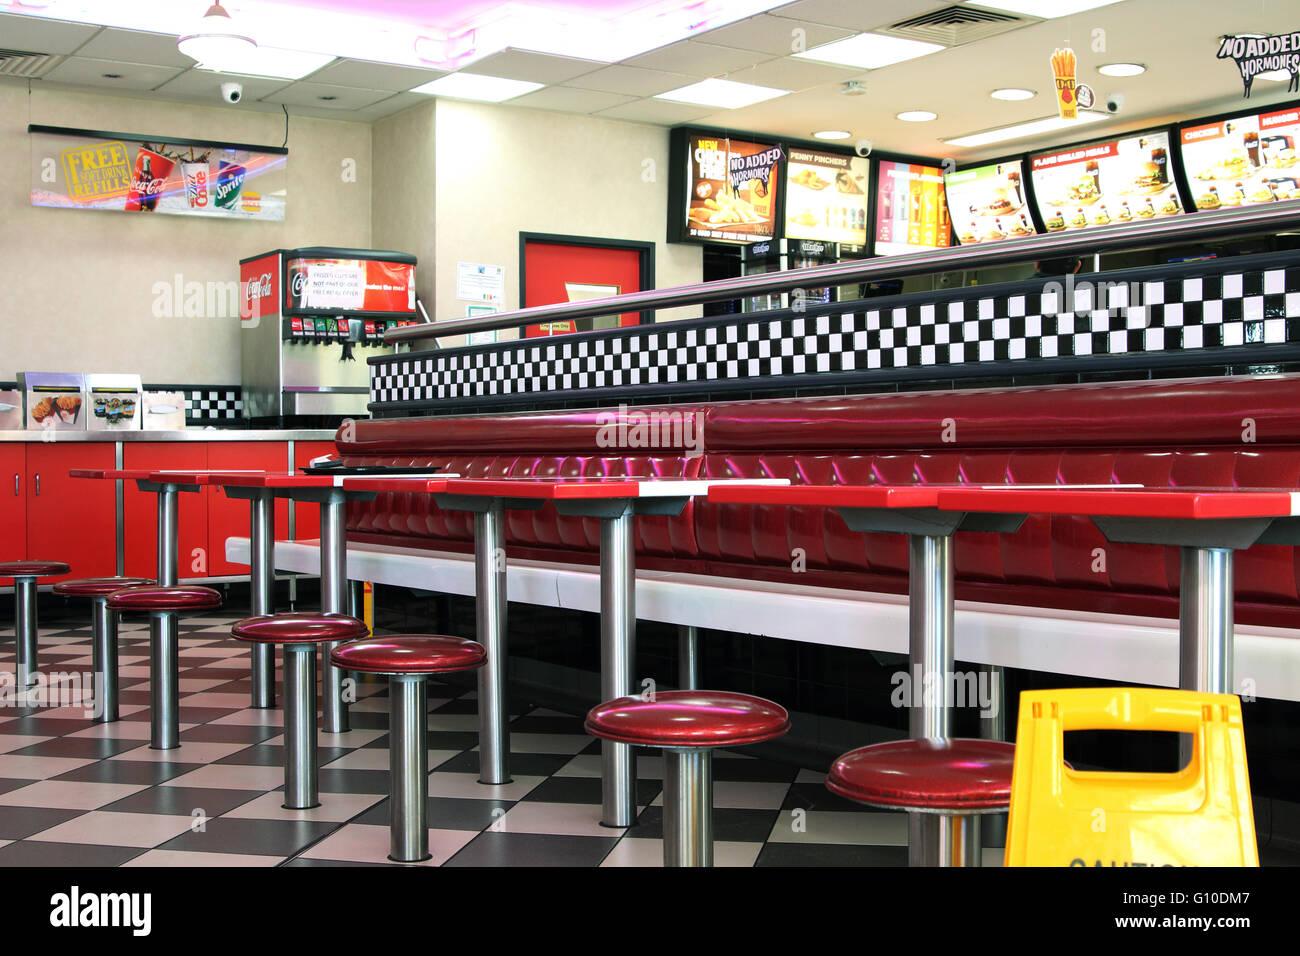 Hungry jack s burger king fast food restaurant interior